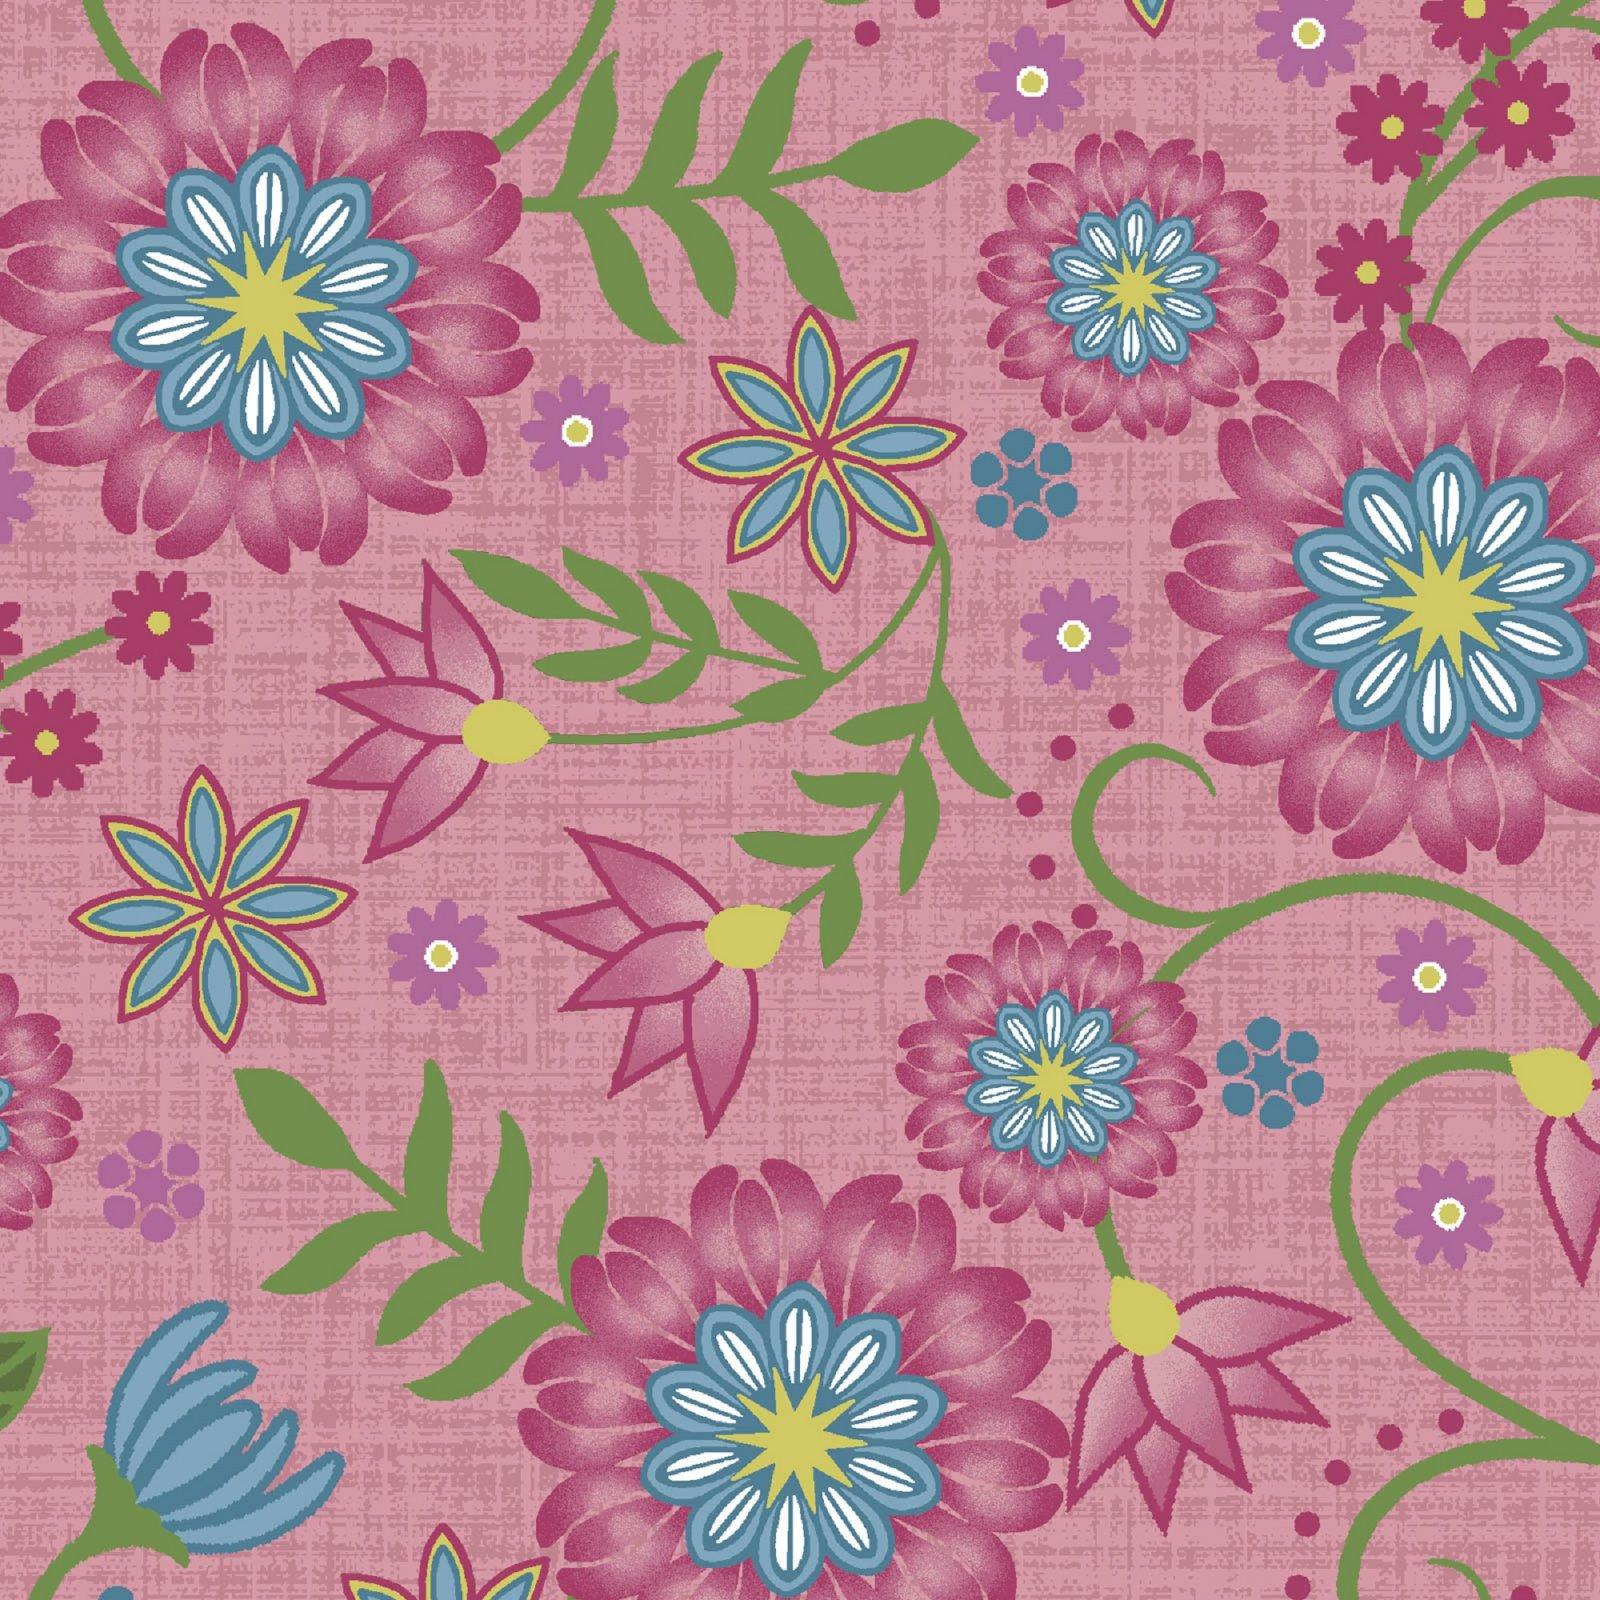 Flower & Vine - Flower and Vine - Pink